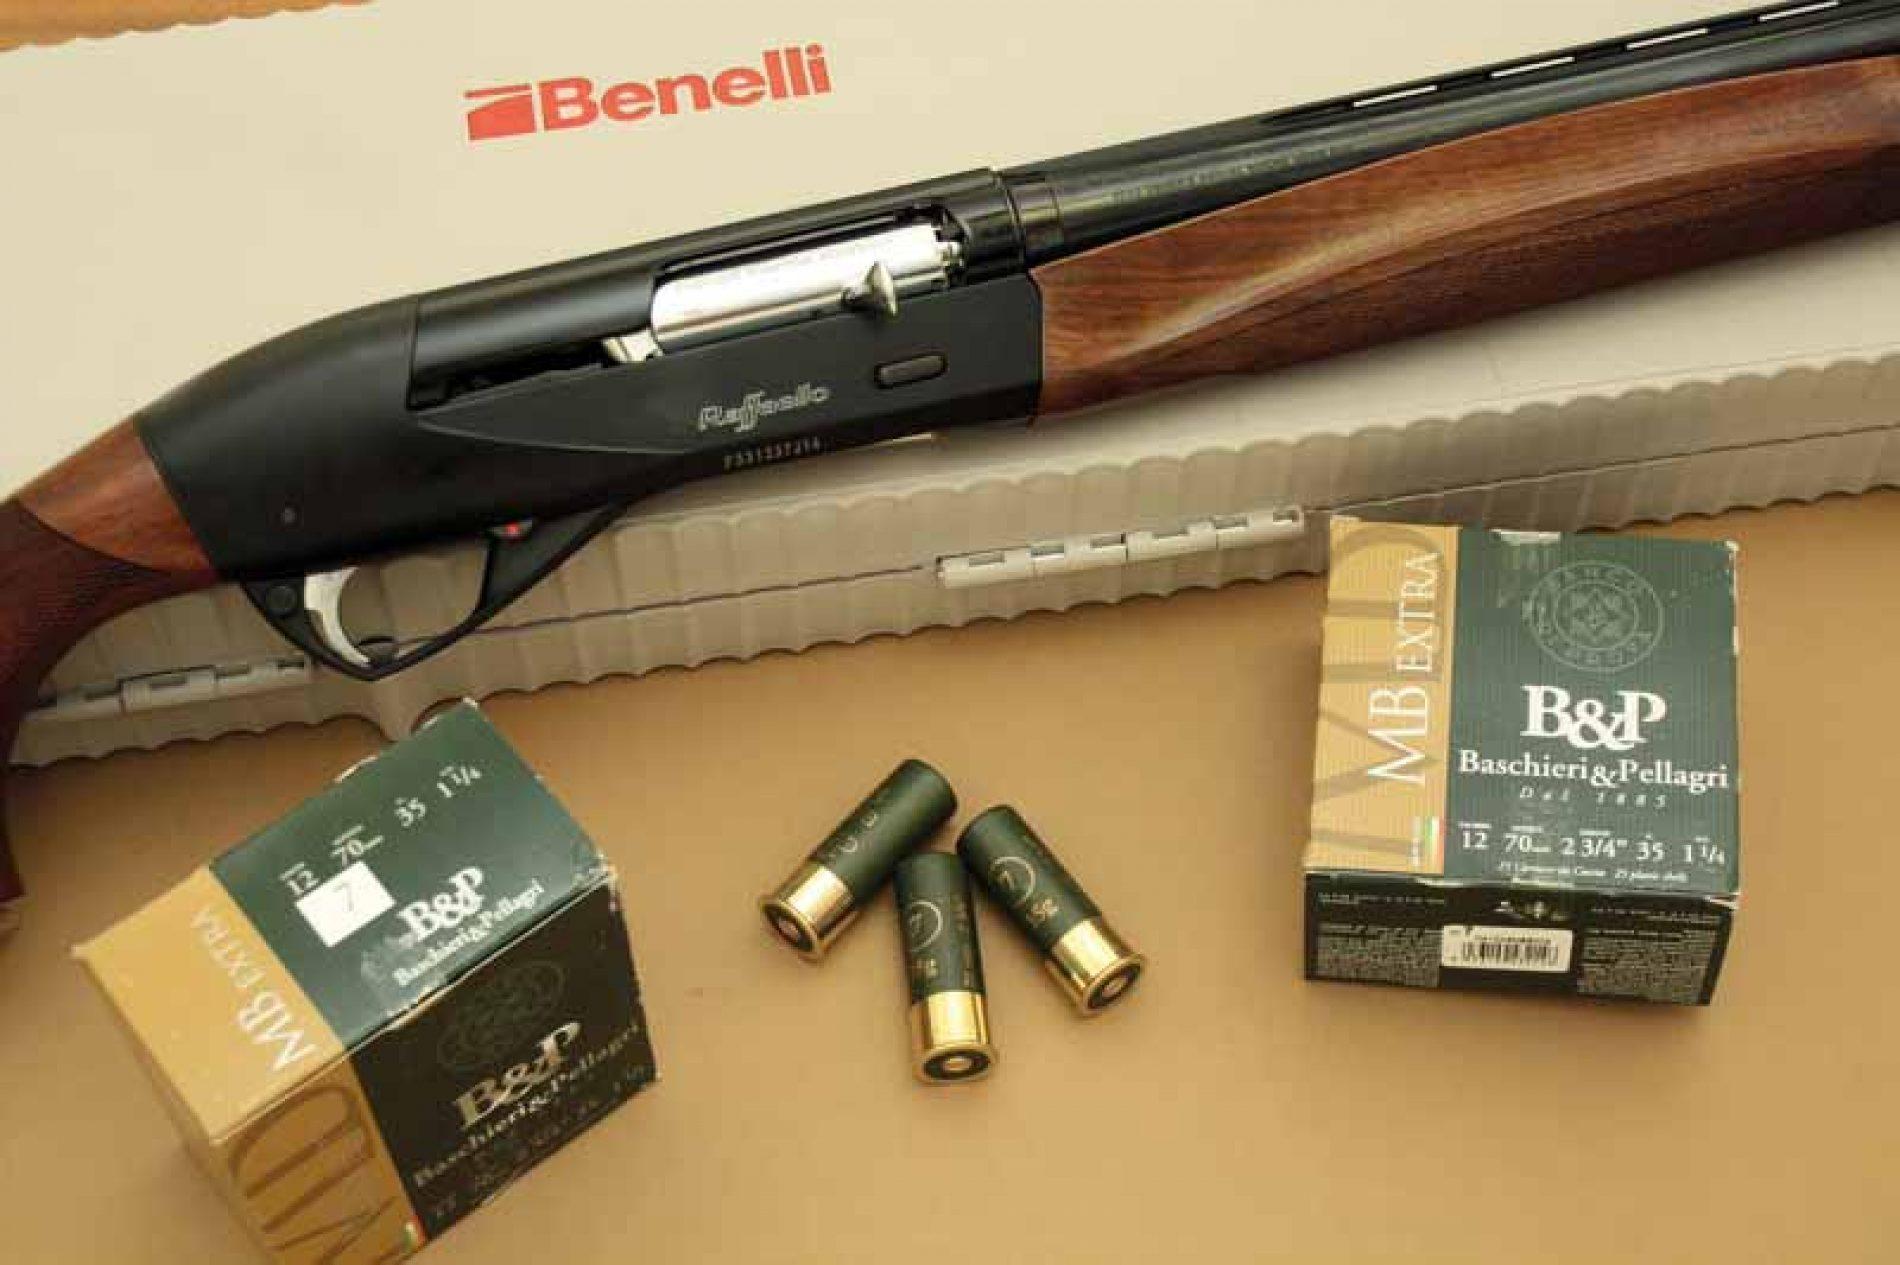 Probamos la escopeta Benelli Rafaello Black